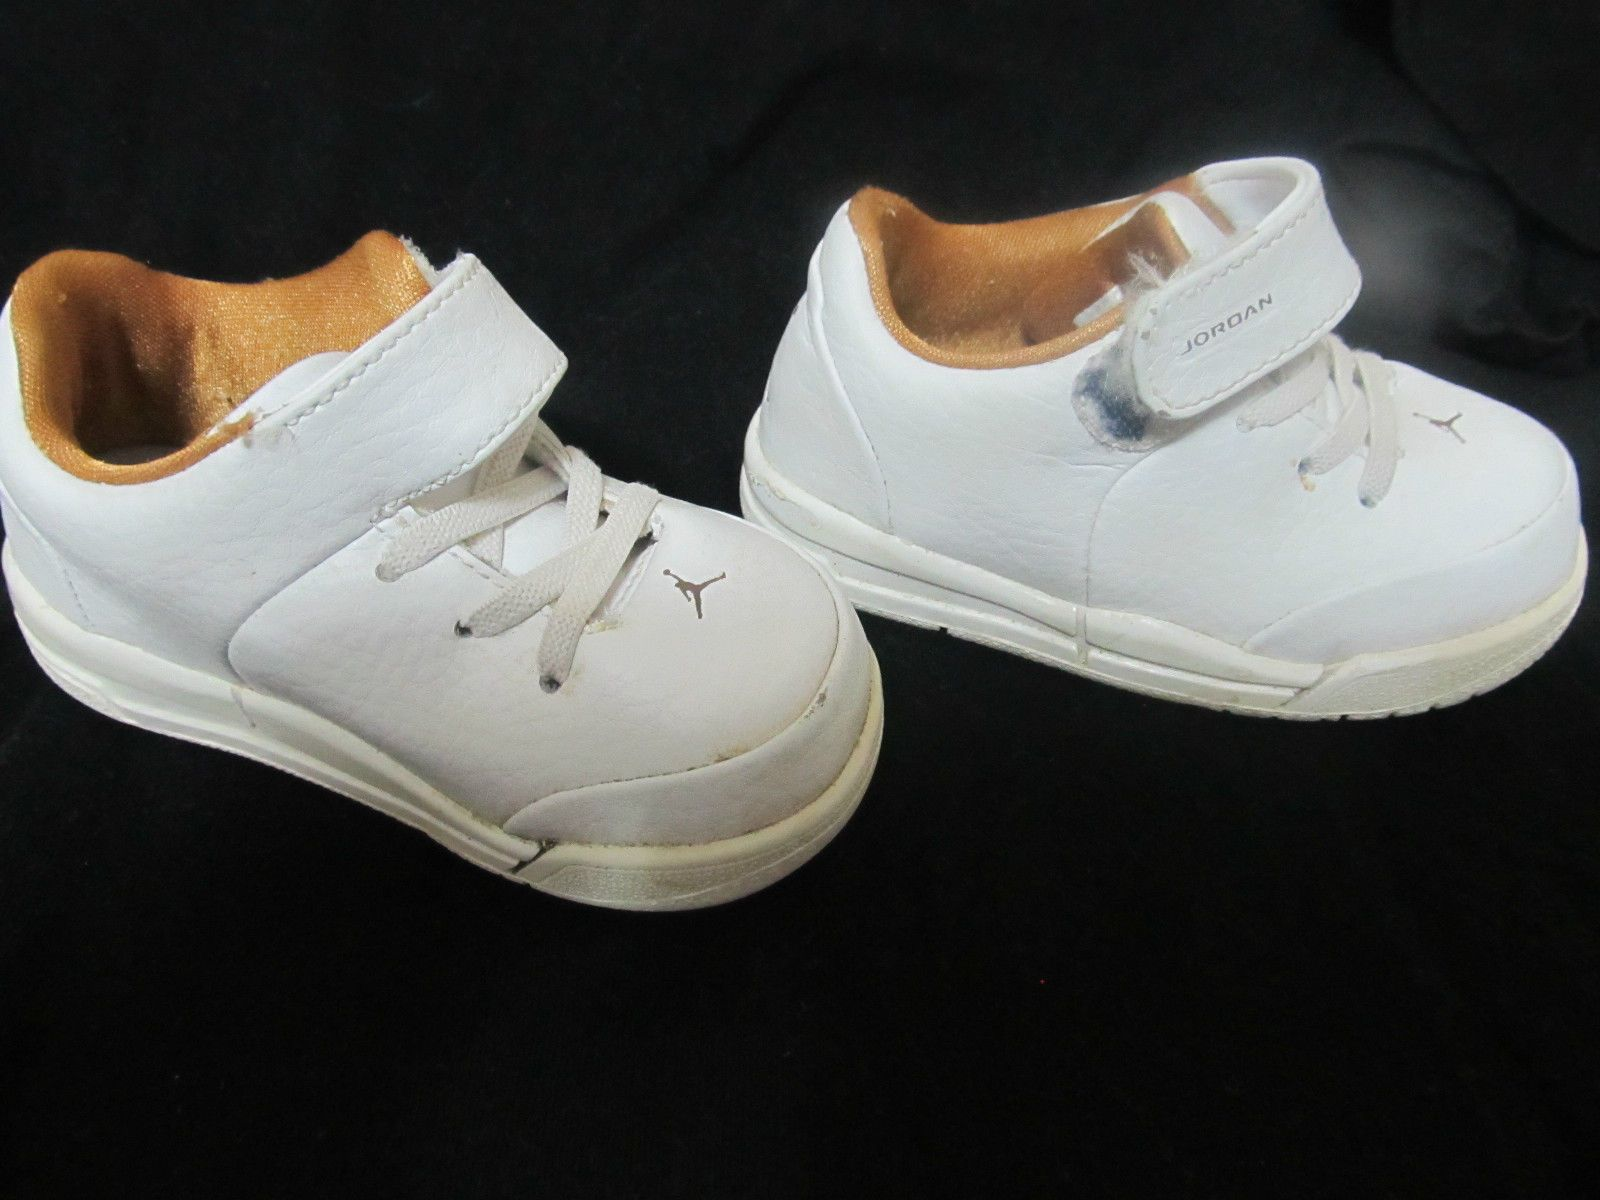 1996 Bébé Air Jordans